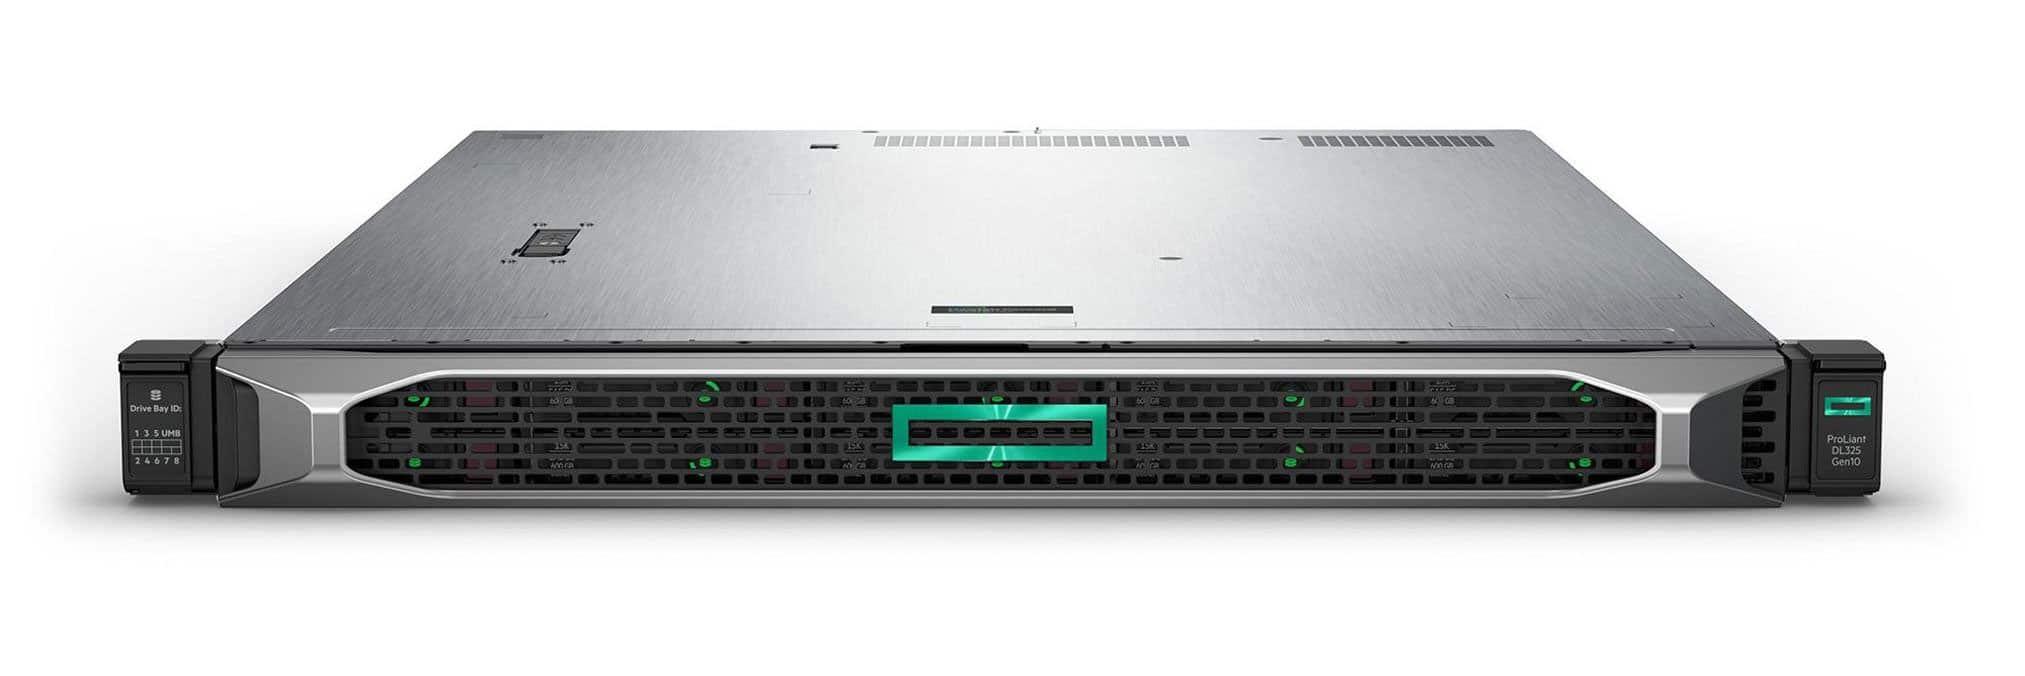 HPE-Proliant-DL325-Gen10-Front